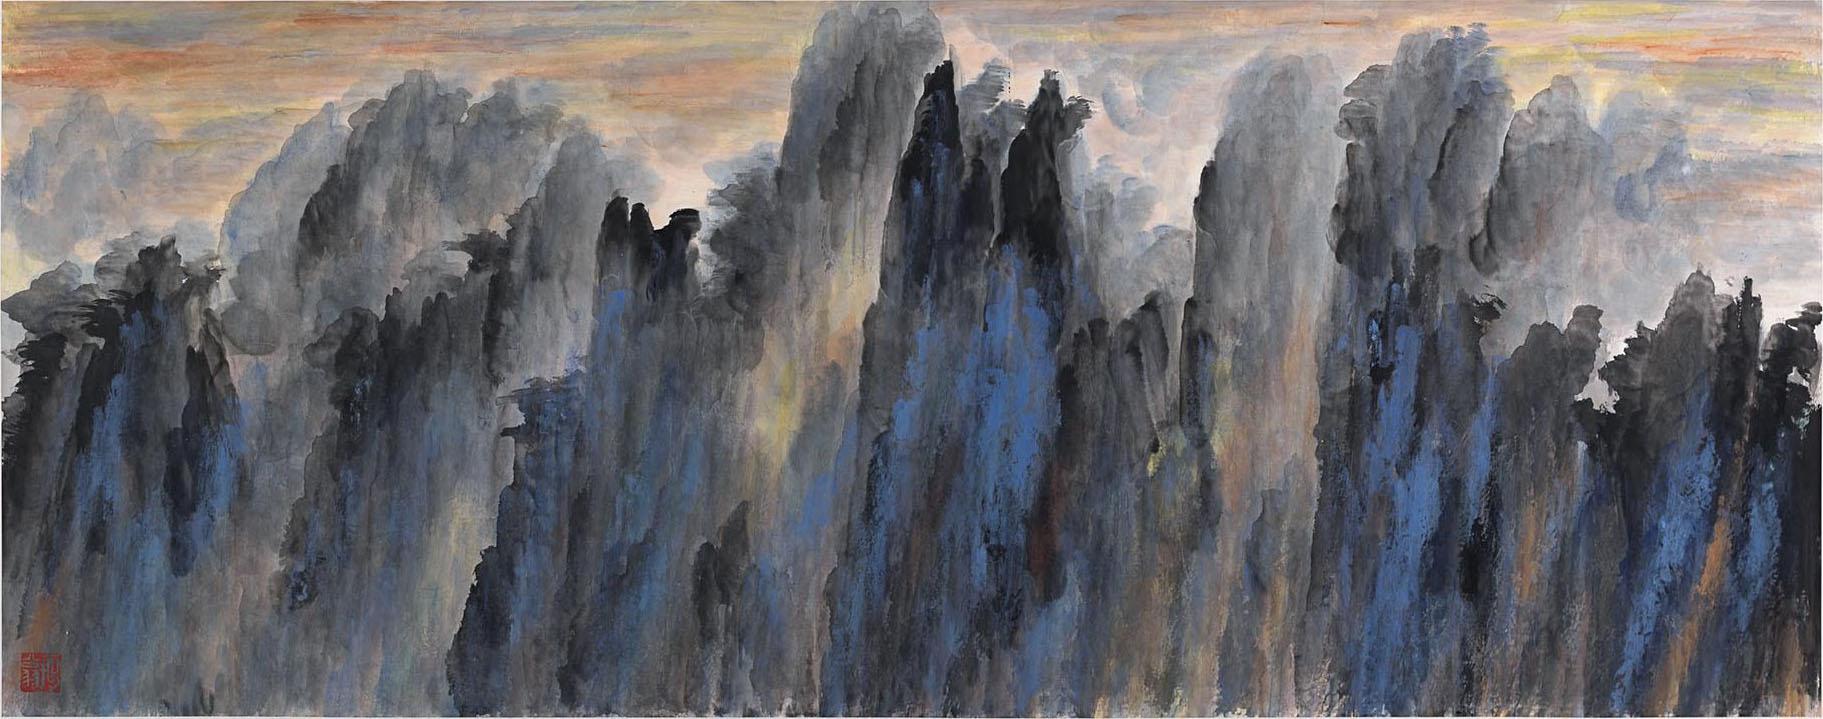 Mao Jianhua ART